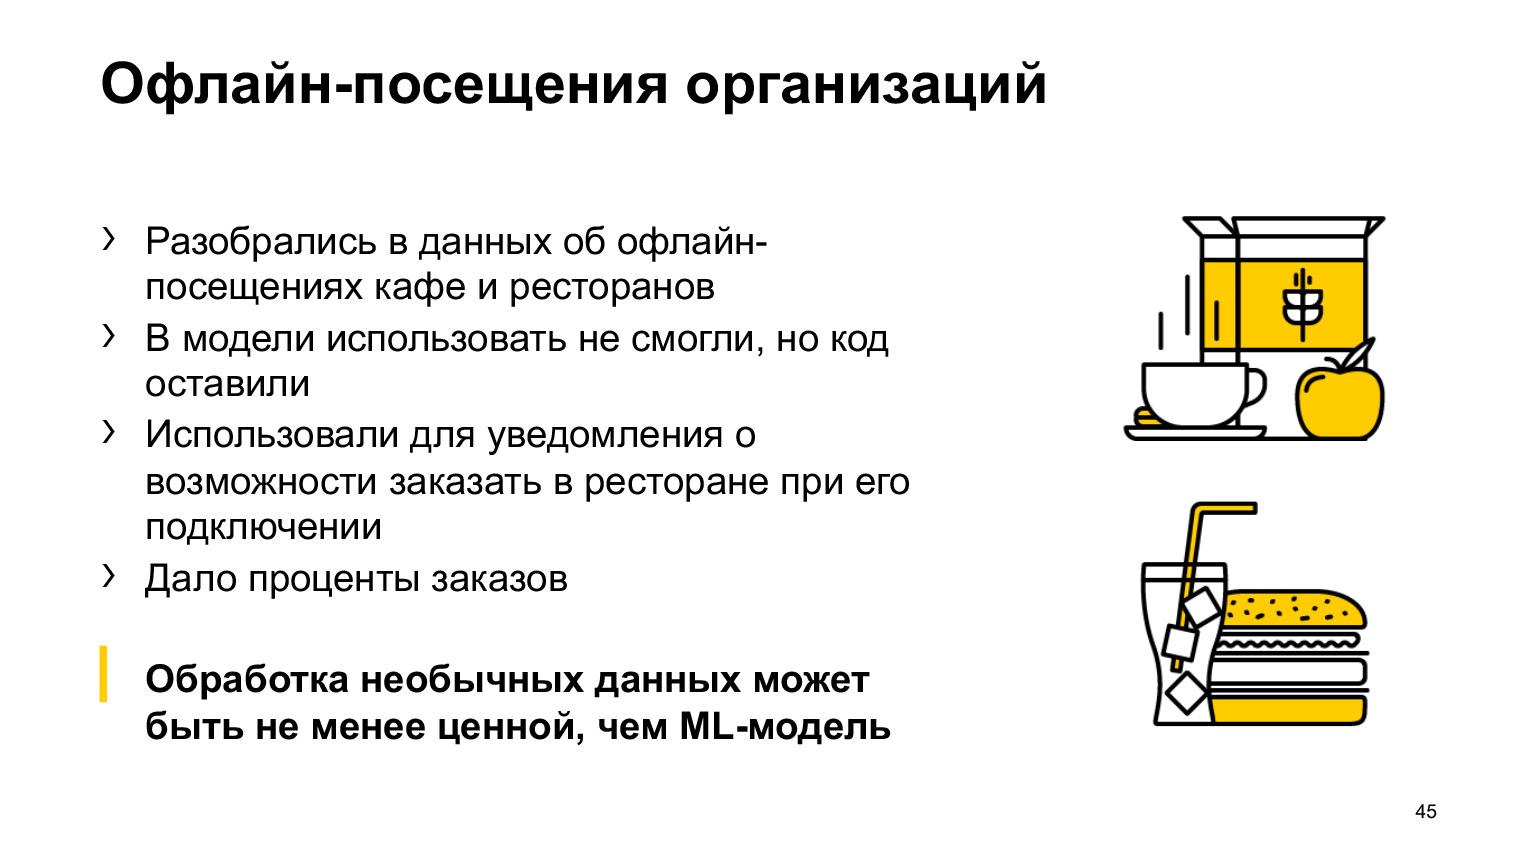 Как коронавирус повлиял на ML-проекты Такси, Еды и Лавки. Доклад Яндекса - 16